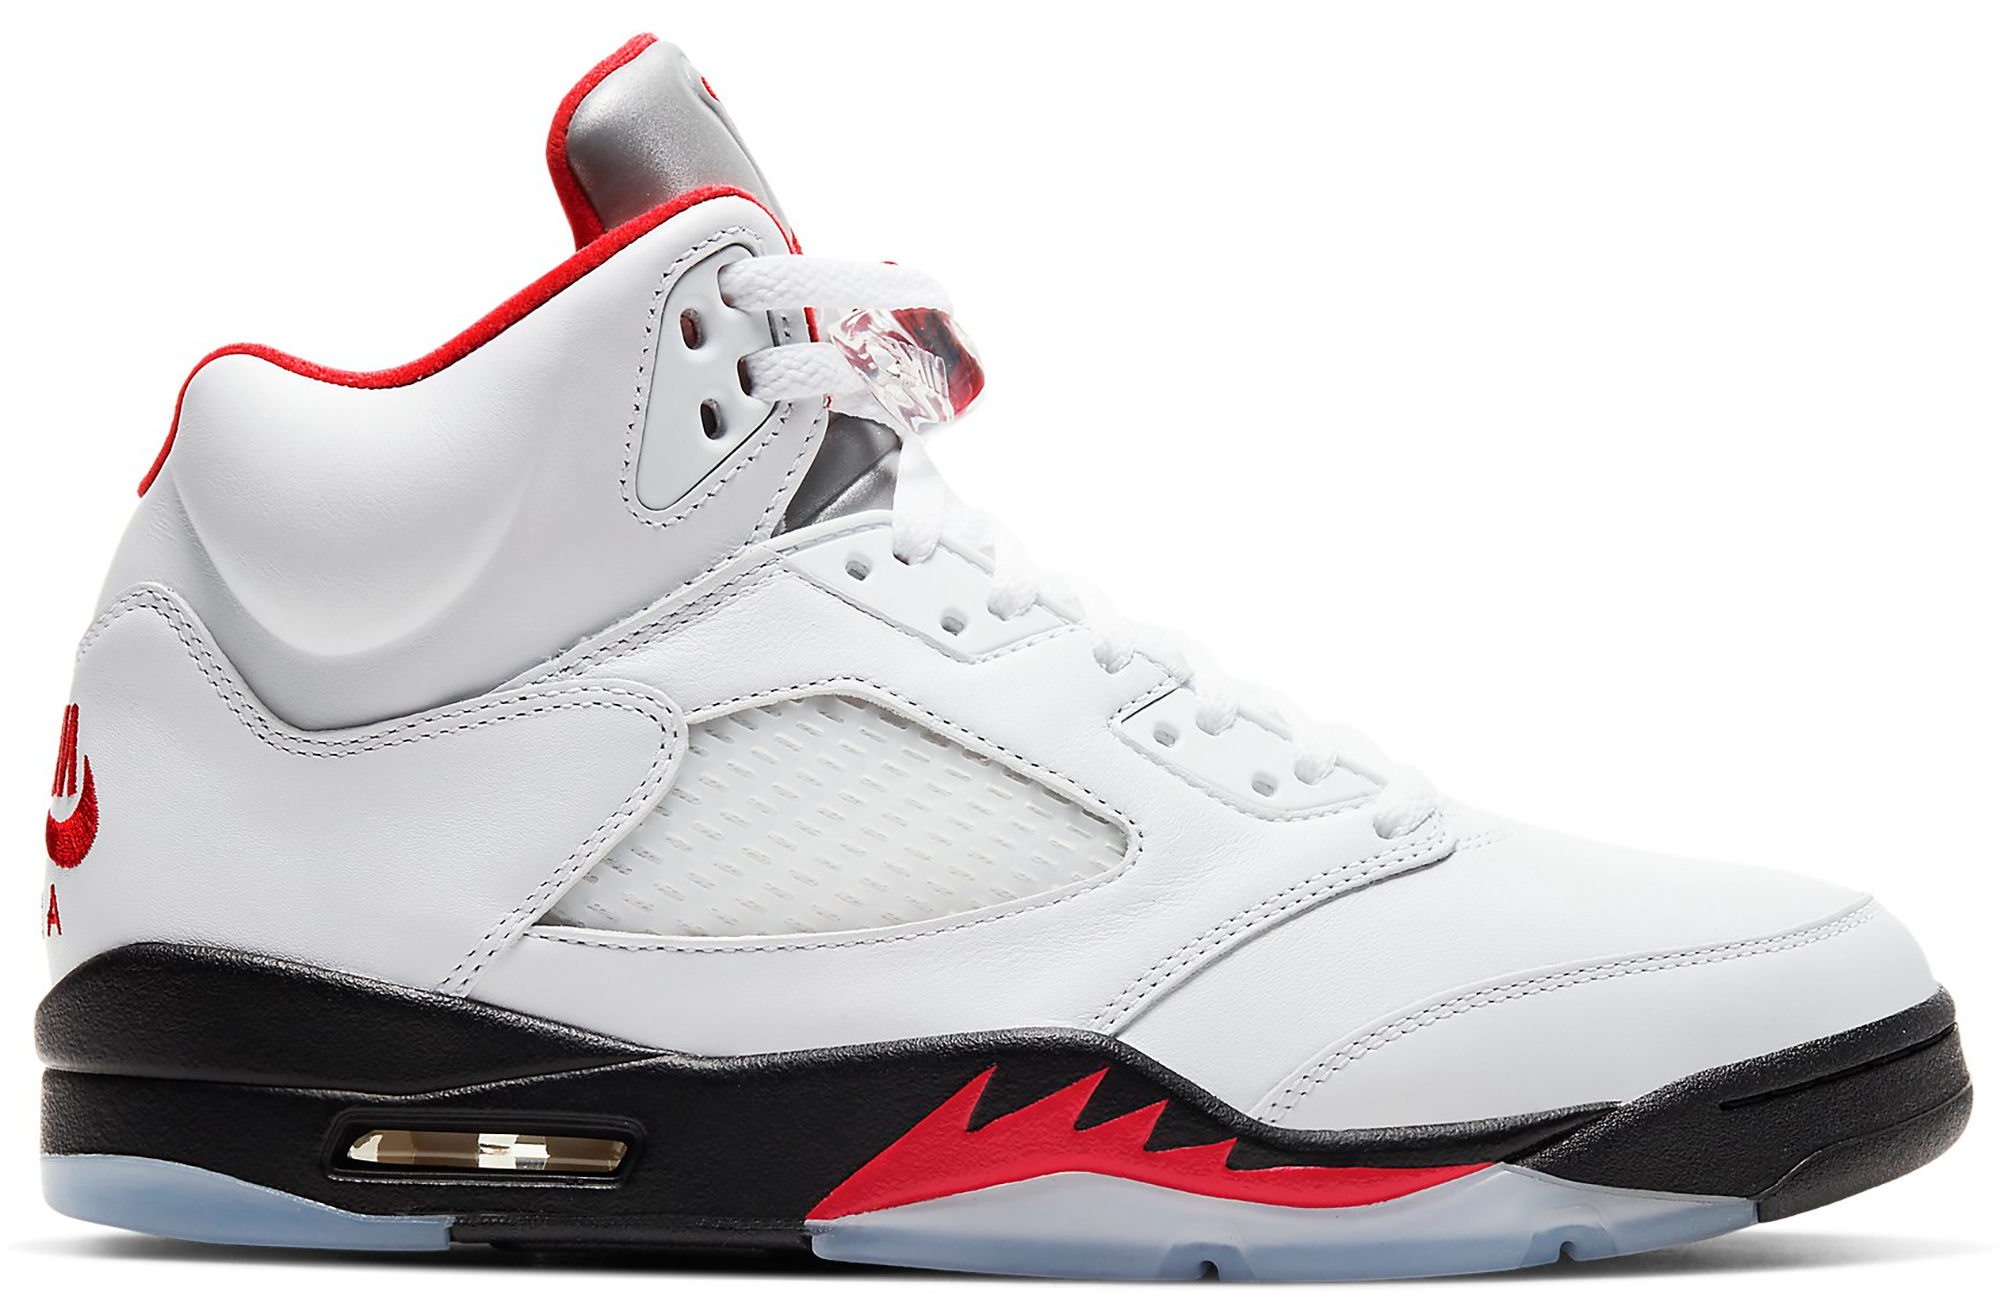 Jordan 5 Retro Fire Red Silver Tongue